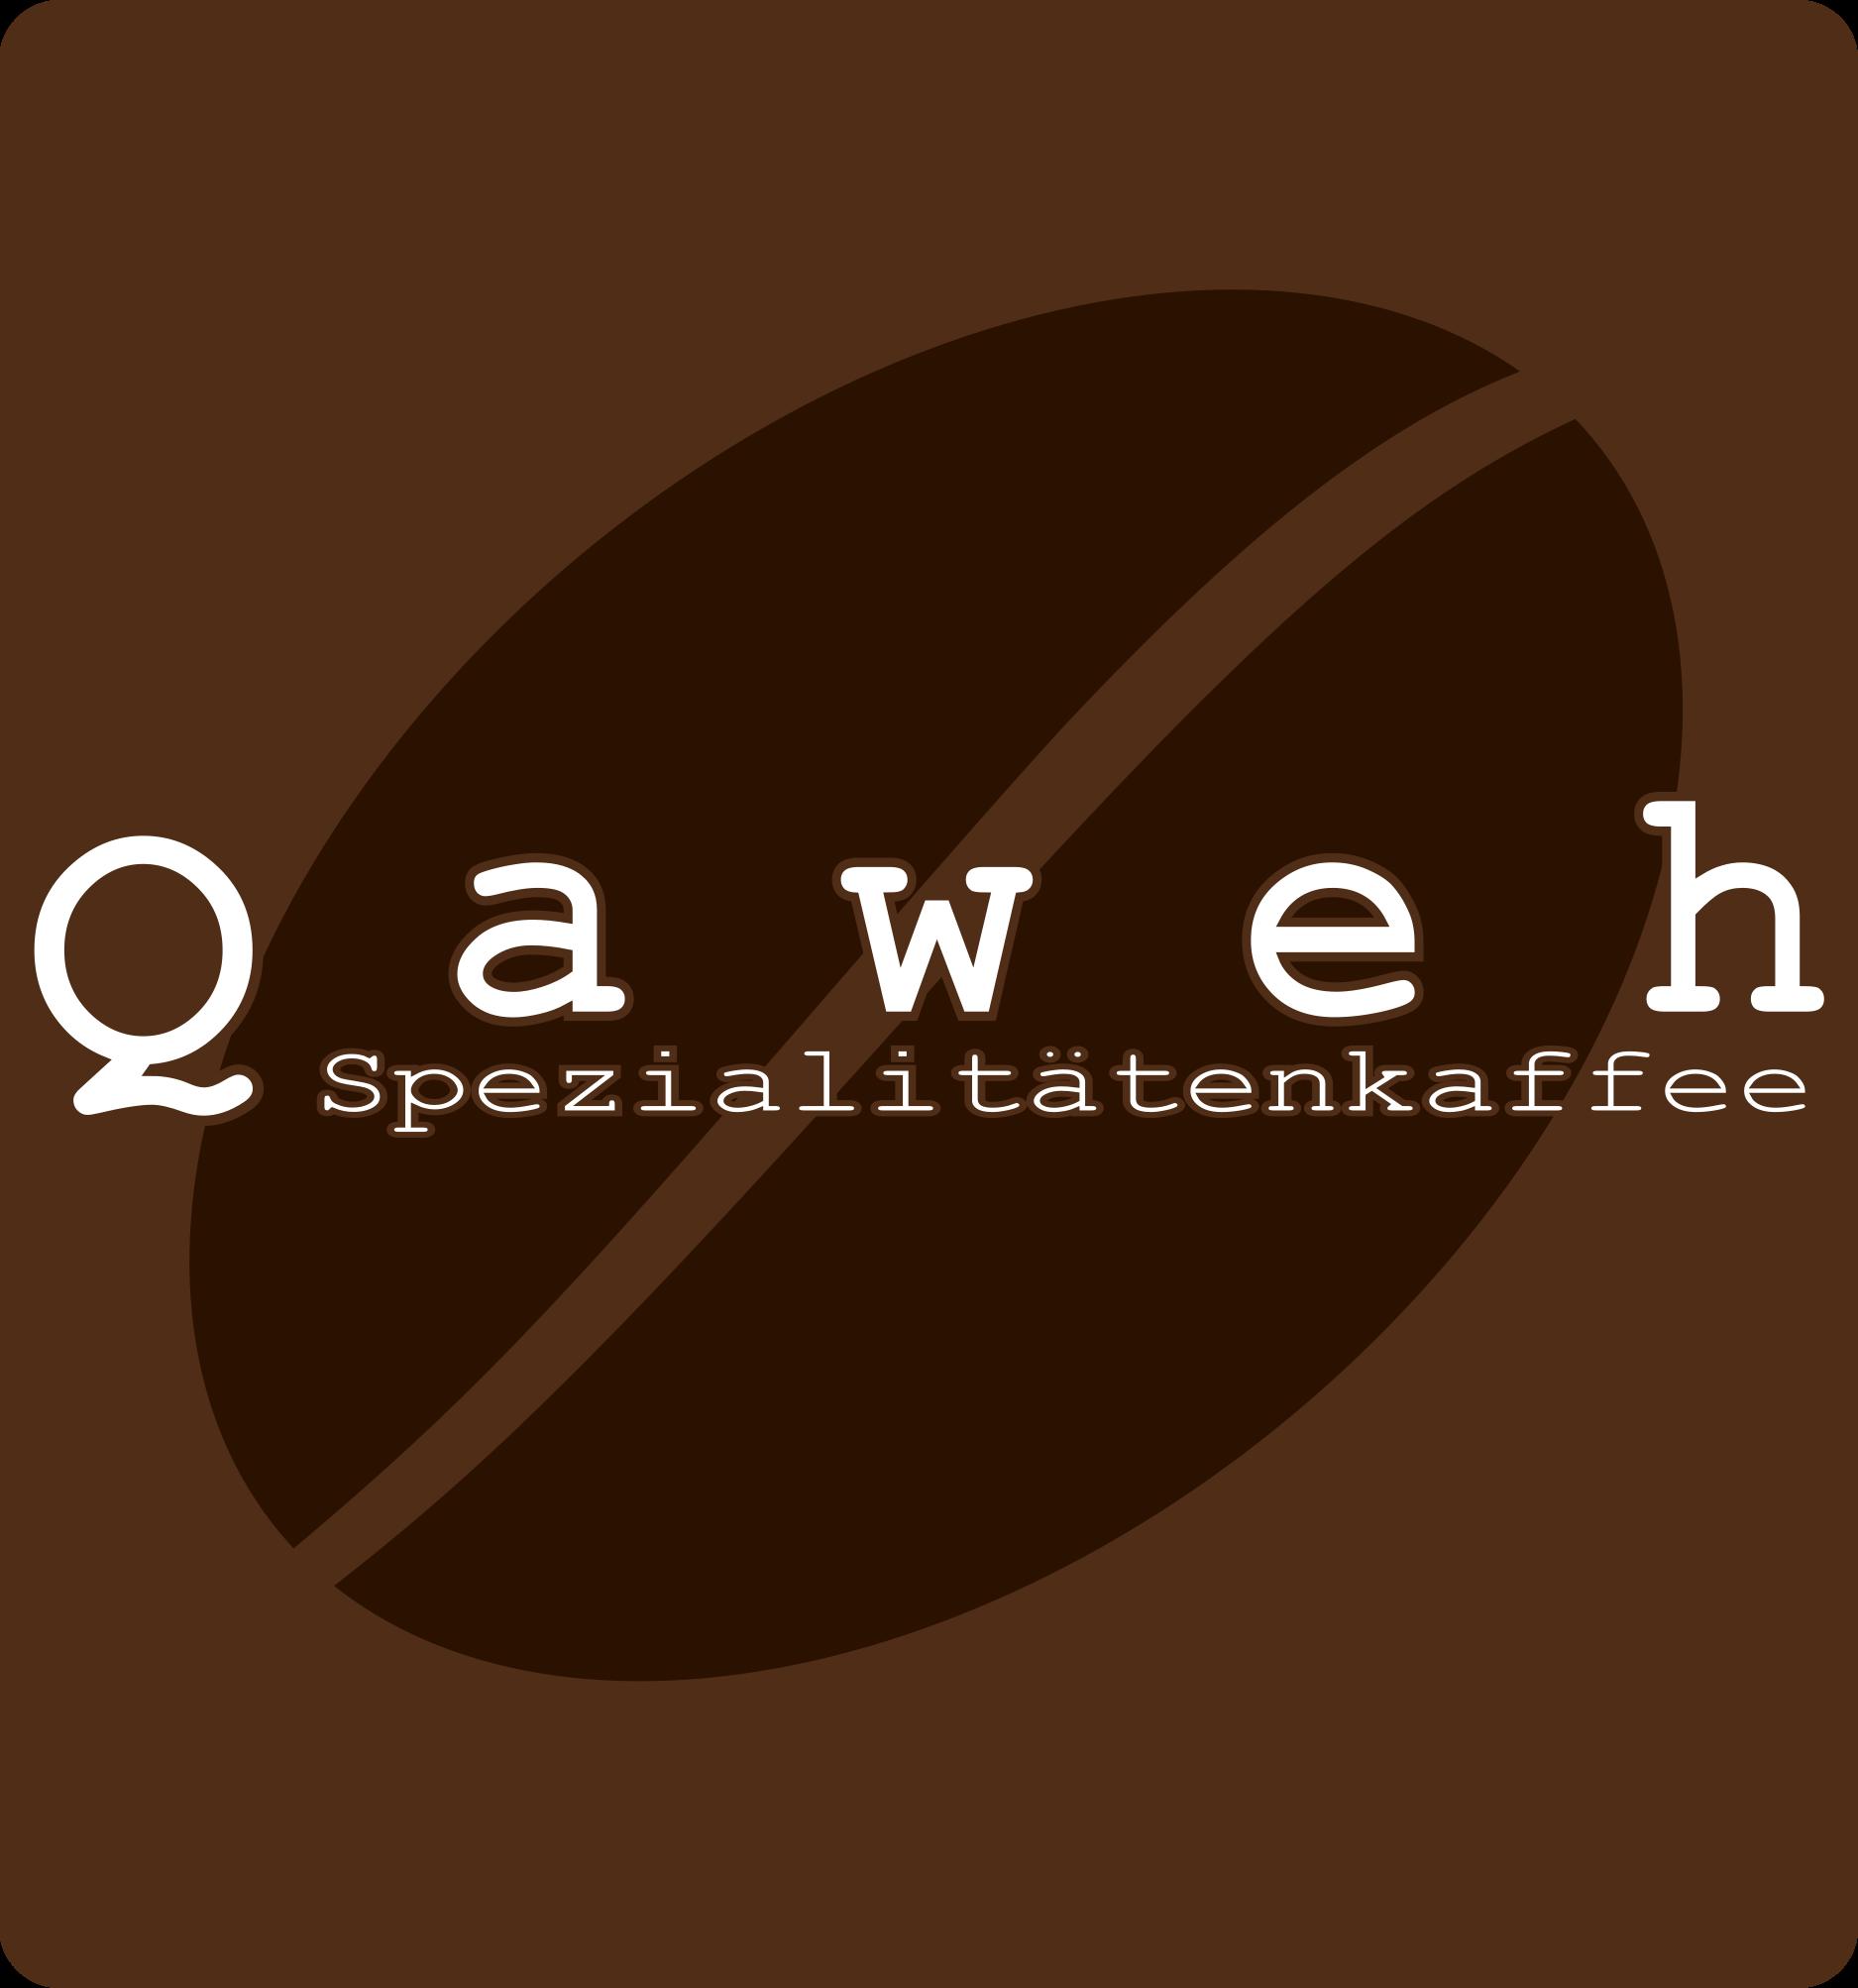 Qaweh Spezialitätenkaffee